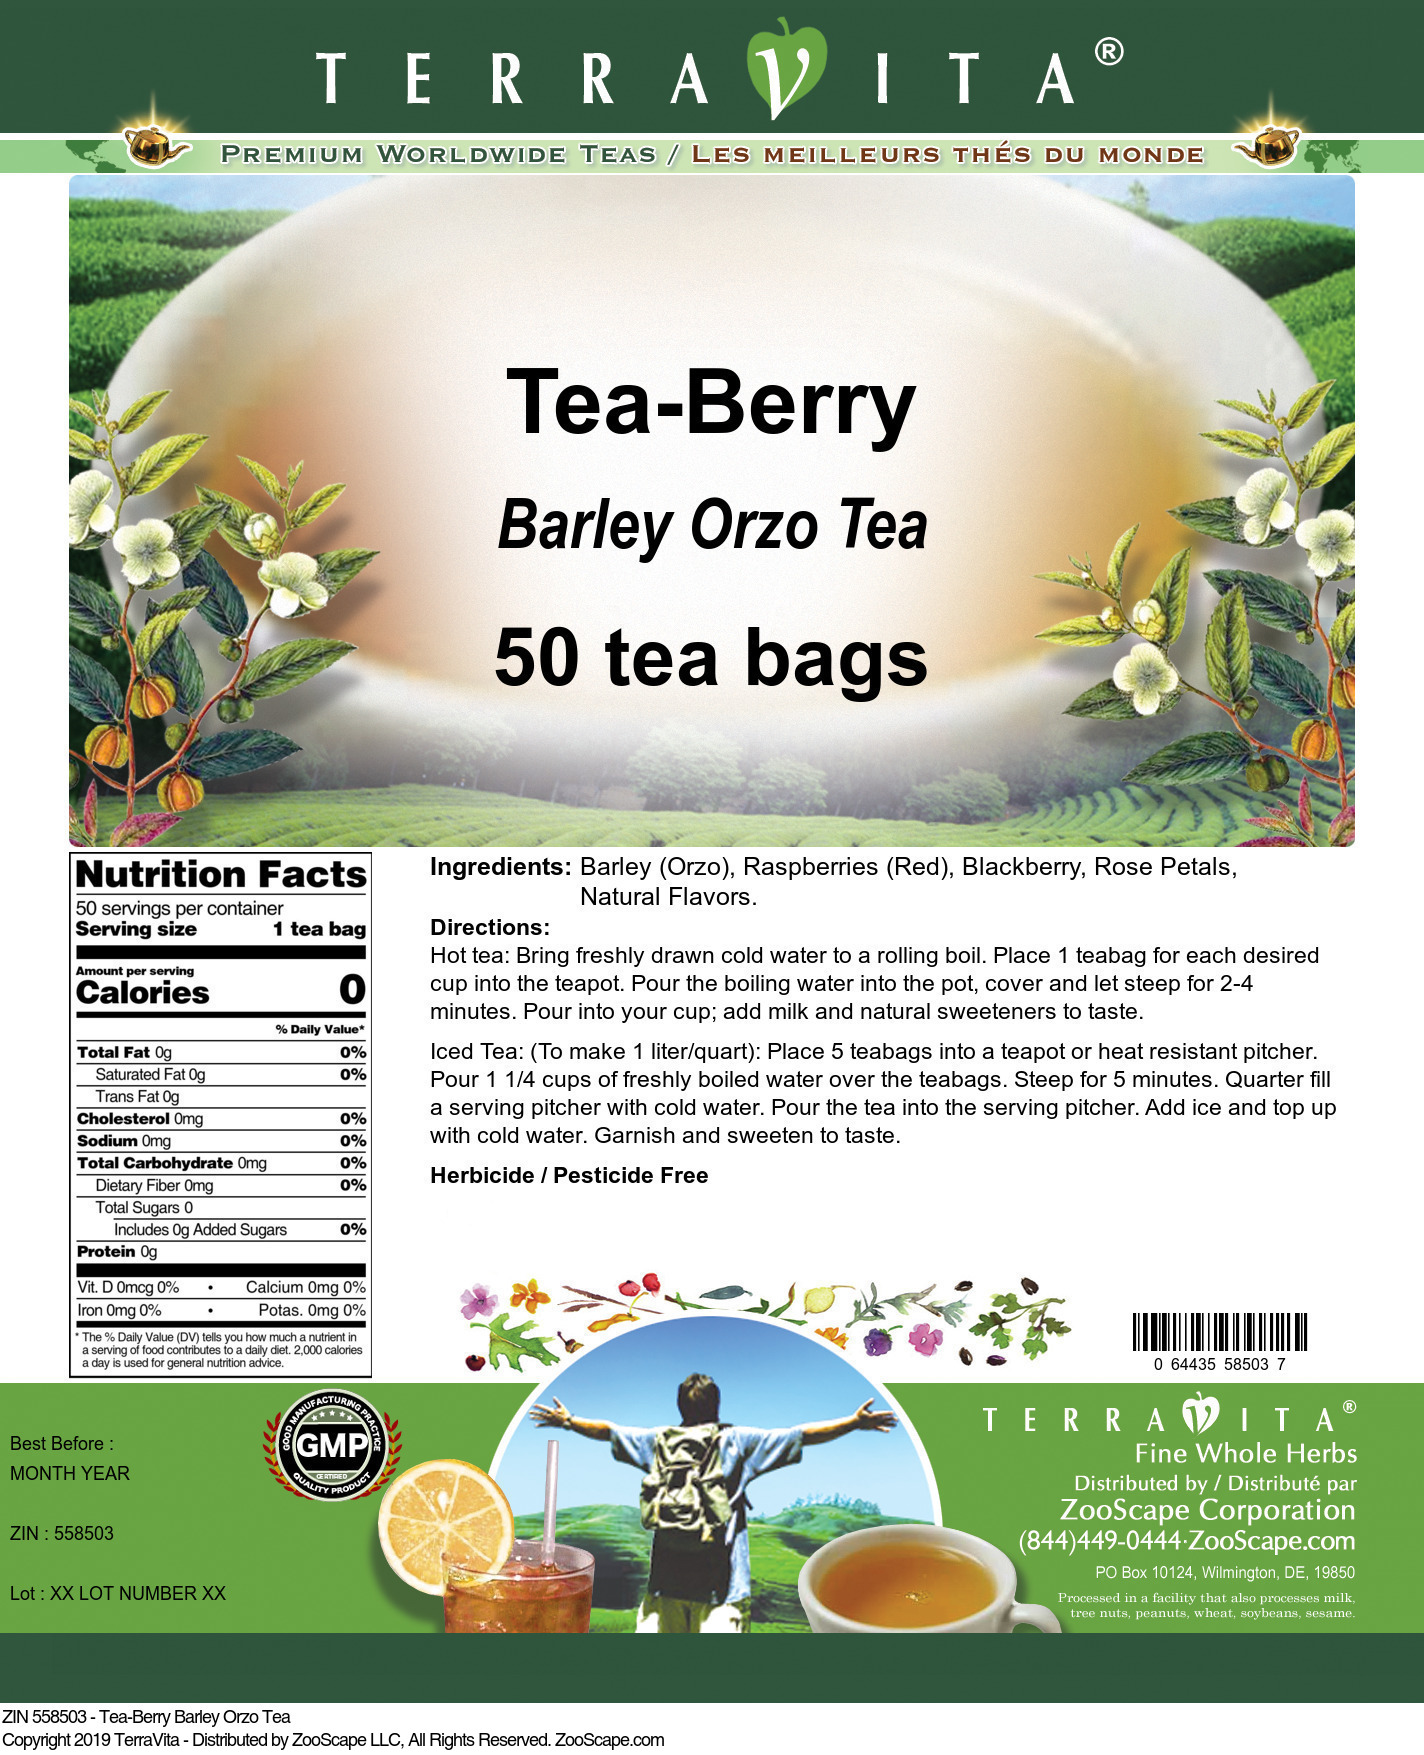 Tea-Berry Barley Orzo